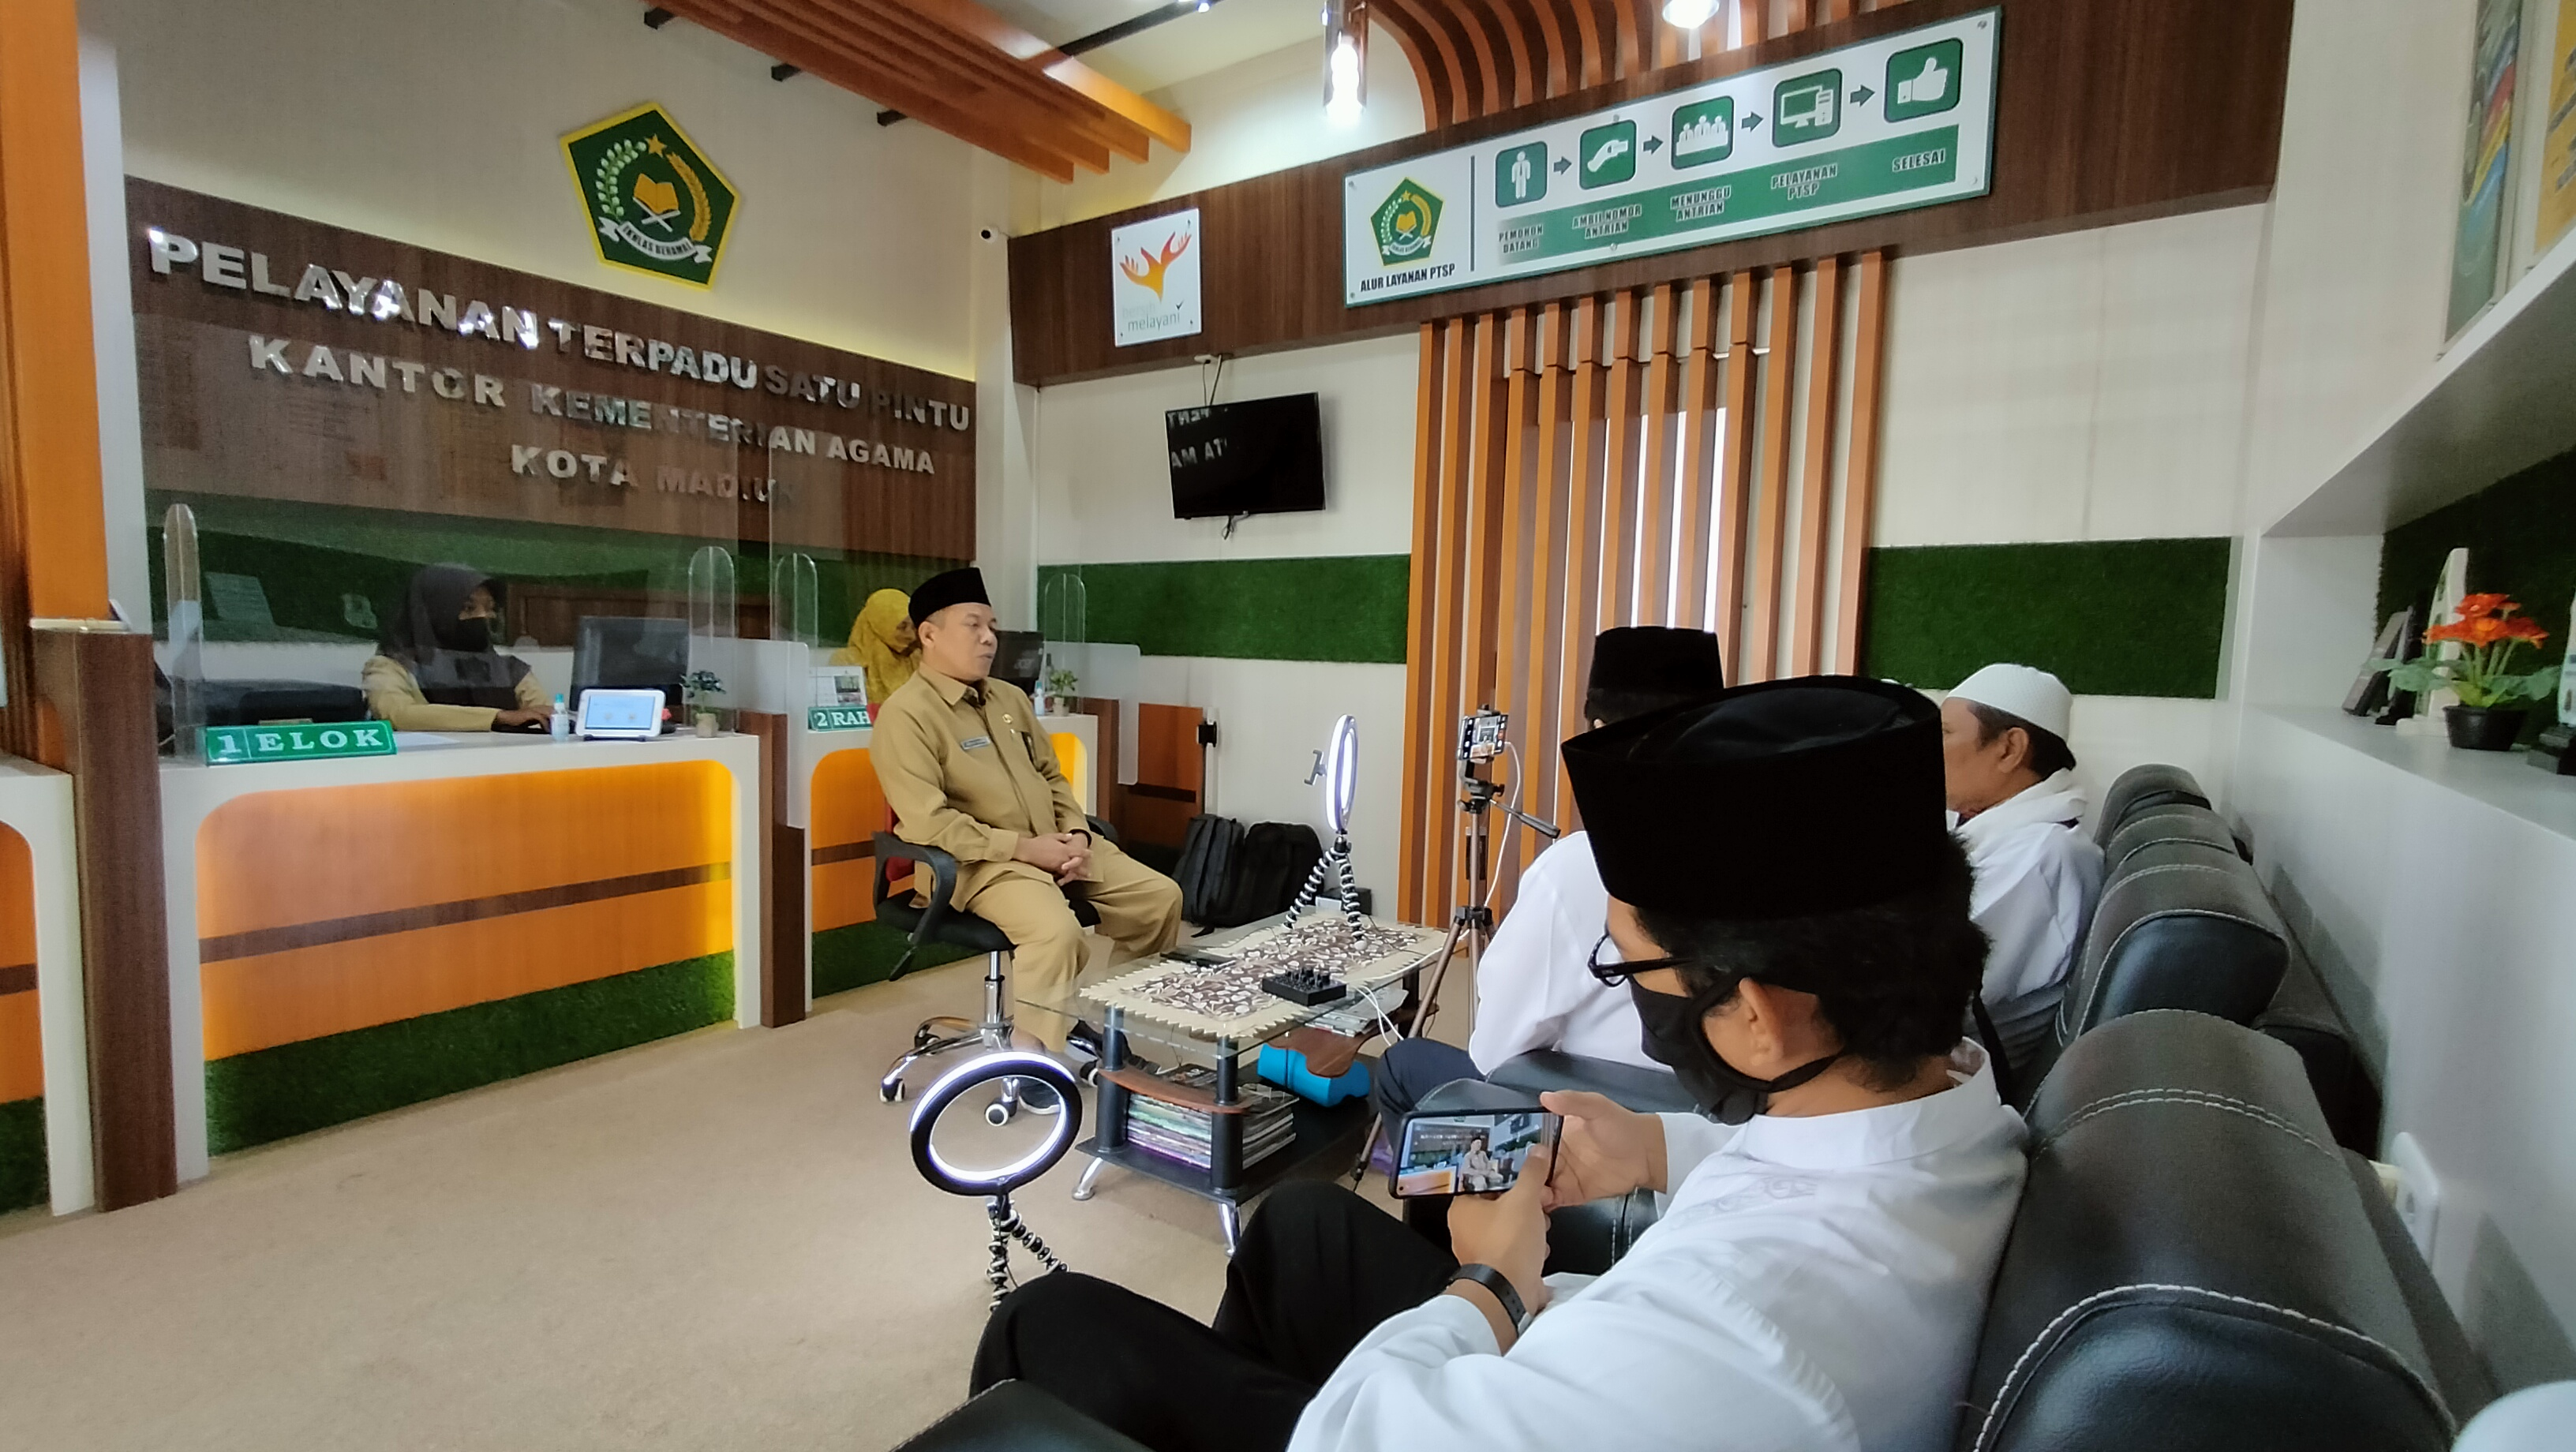 Panitia Pondok Ramadhan Virtual MIN 2 Kota Madiun Silaturahmi Dengan Kepala Kantor Kemenag Kota Madiun